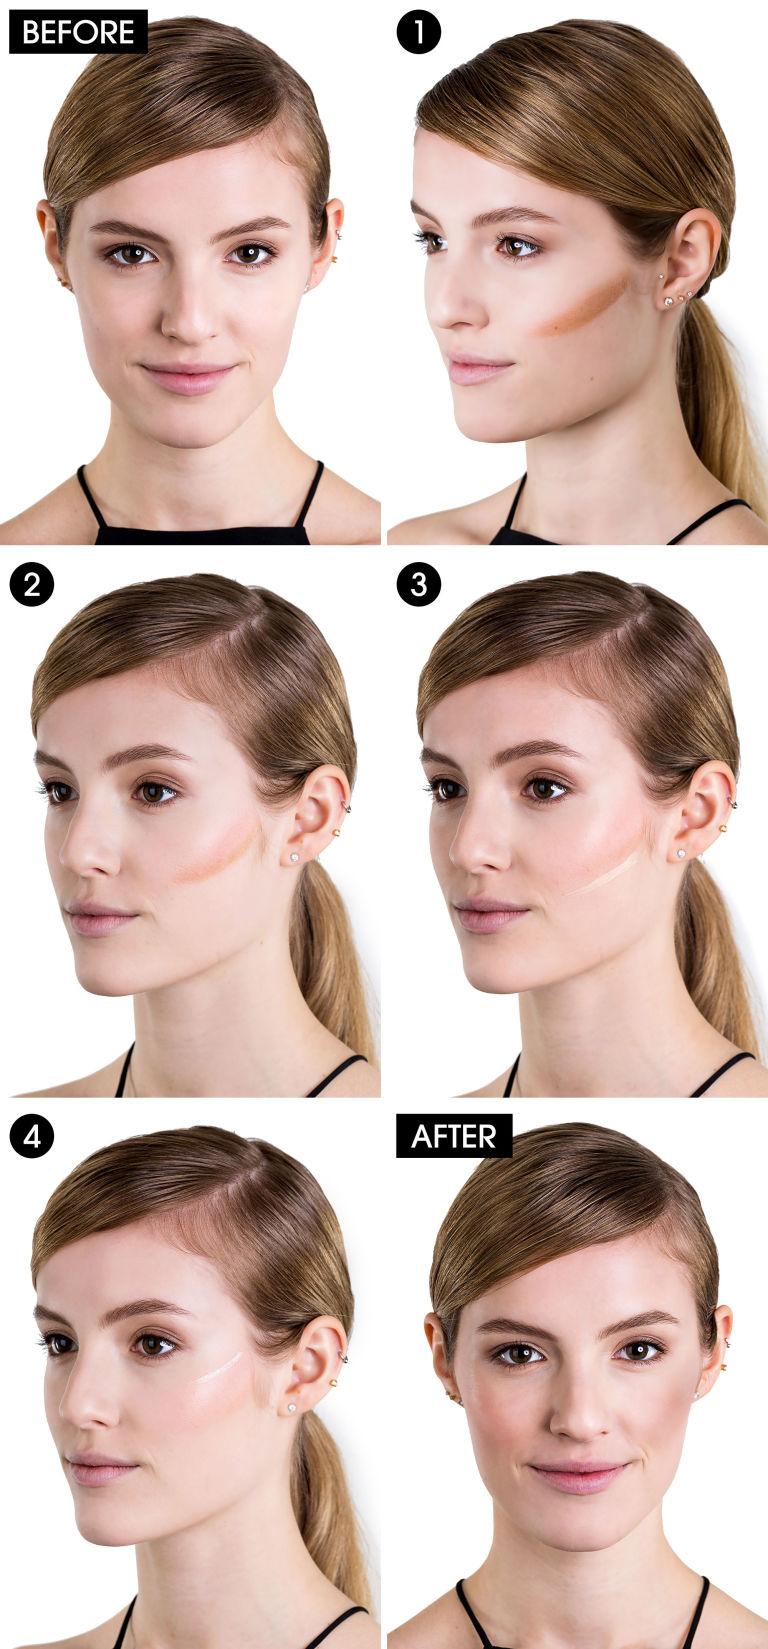 How to Define Cheekbones - Get Defined Cheekbones in Four Easy Steps